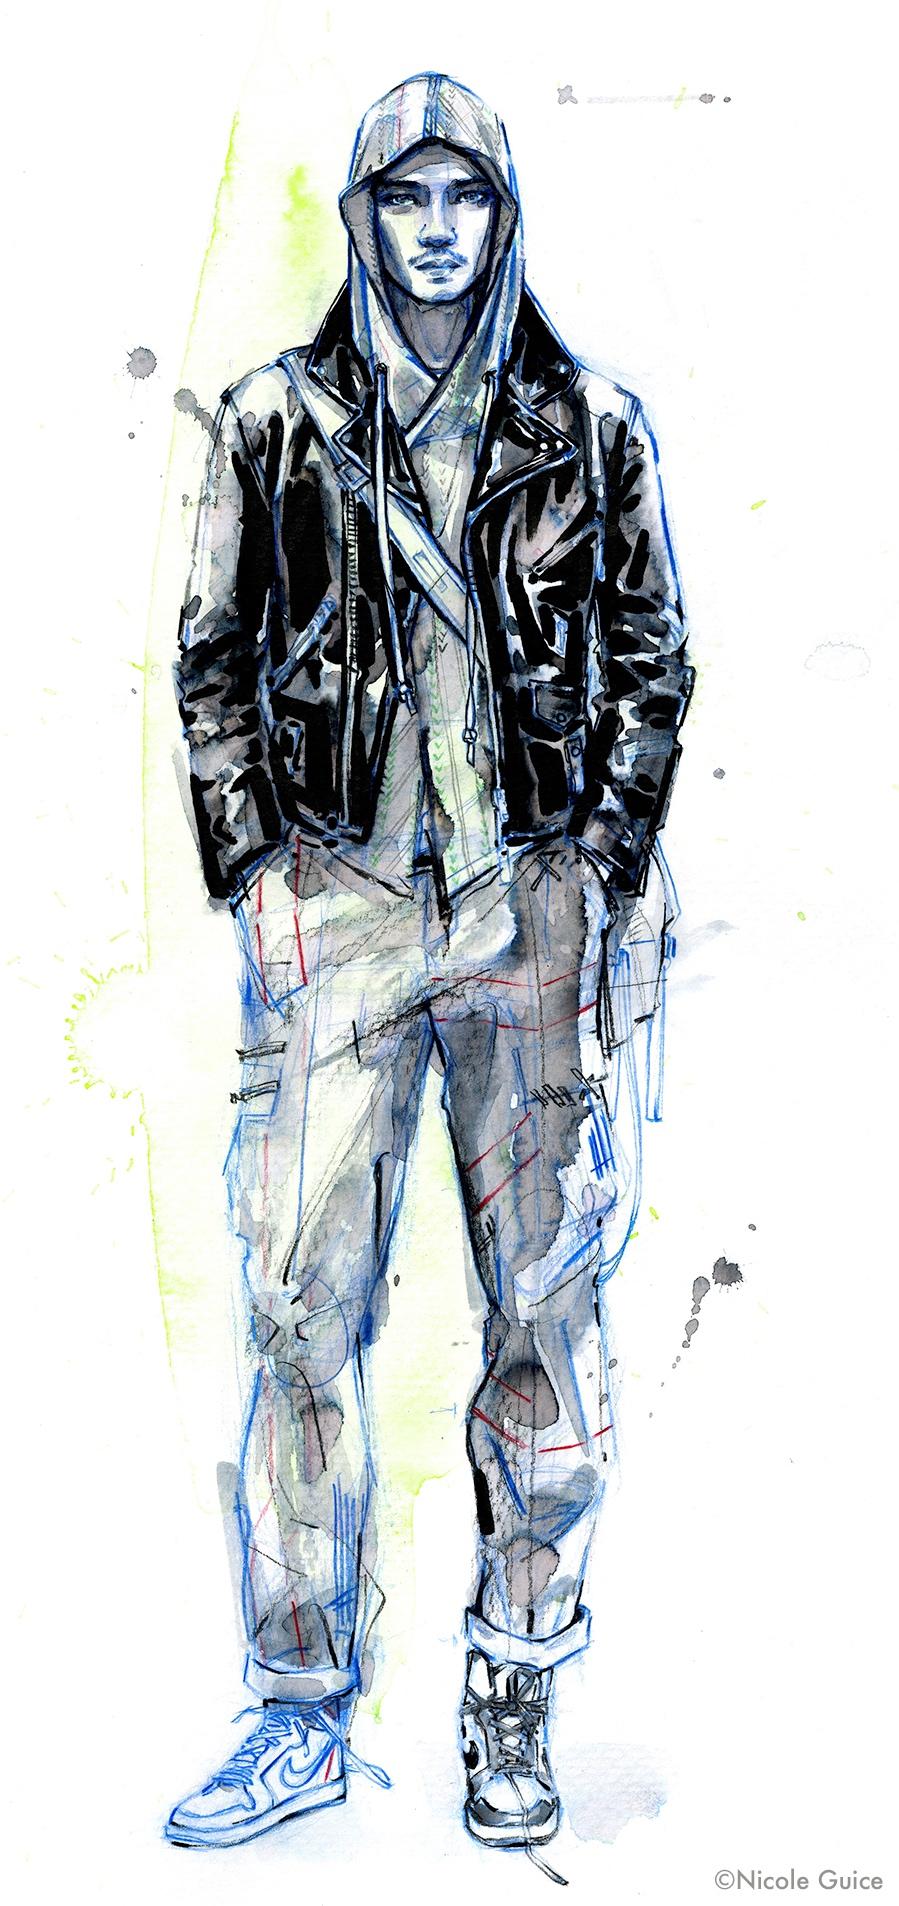 A+man_fashion+illustration_Nicole+Guice.jpg